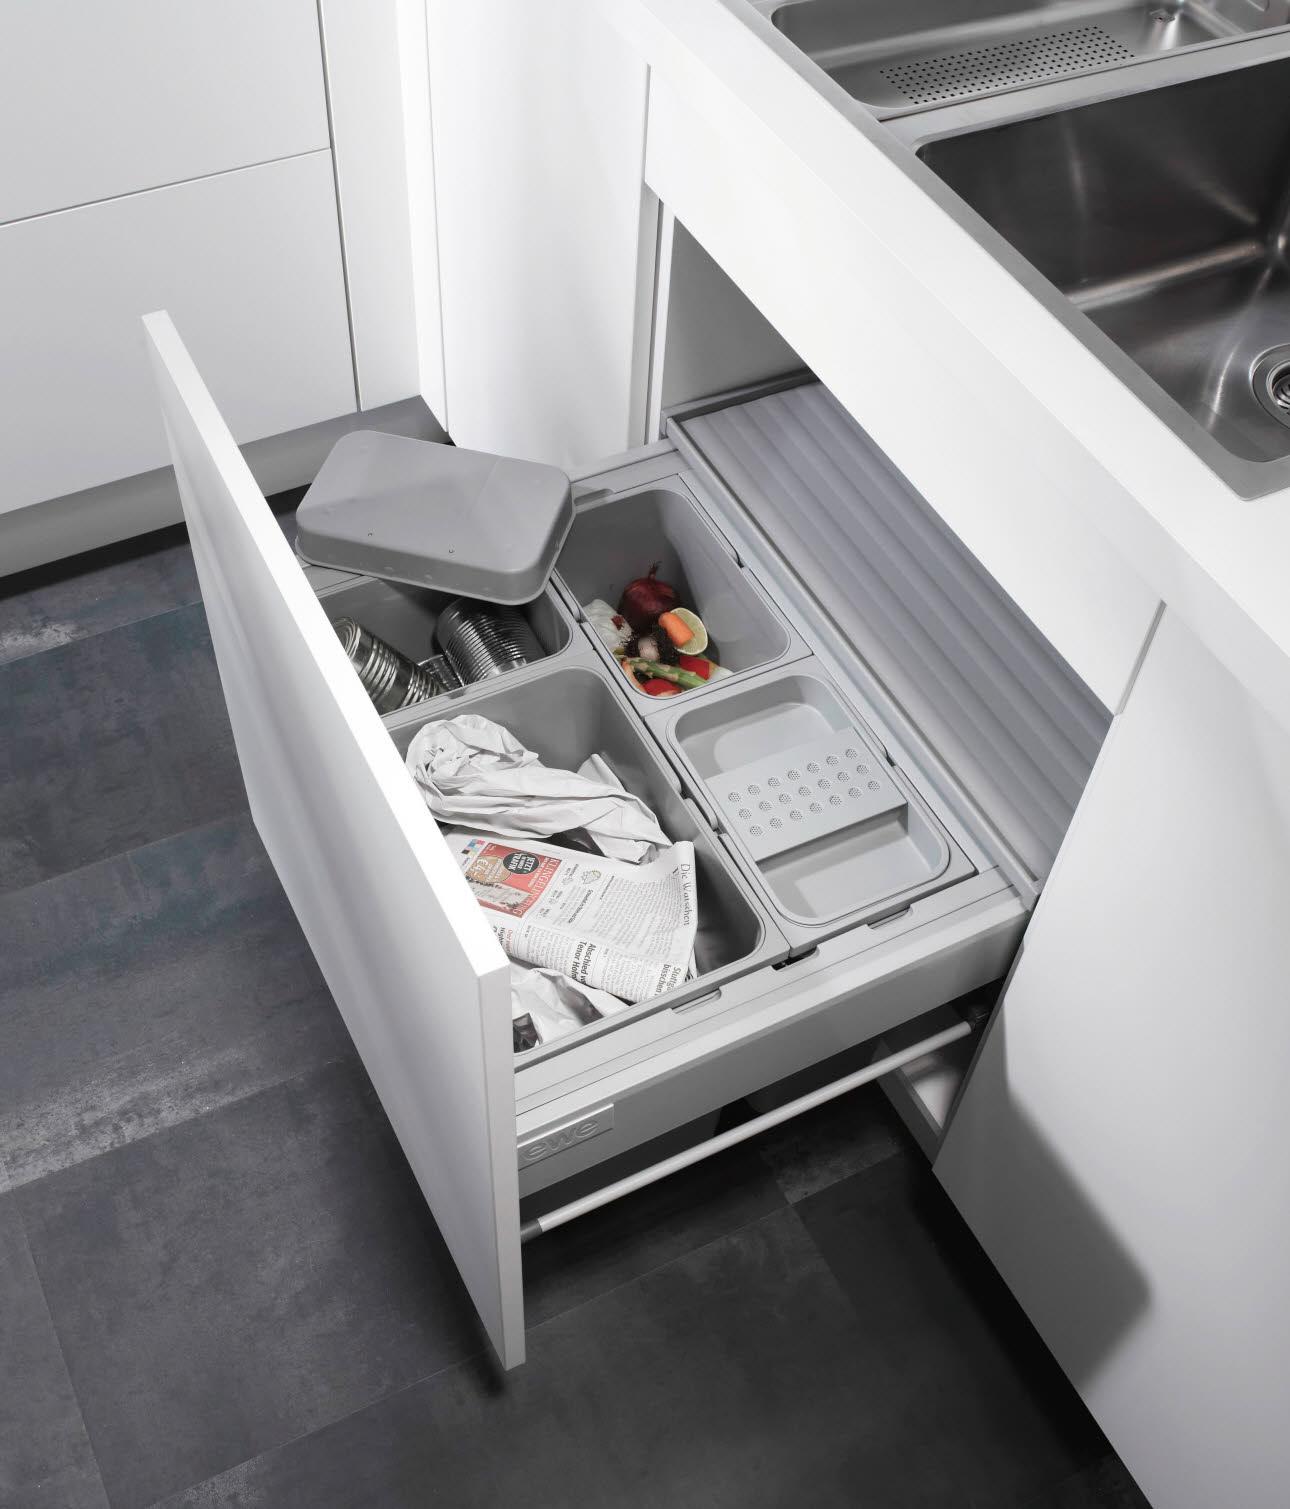 abfallsystem k chen abfallsystem k che ikea. Black Bedroom Furniture Sets. Home Design Ideas